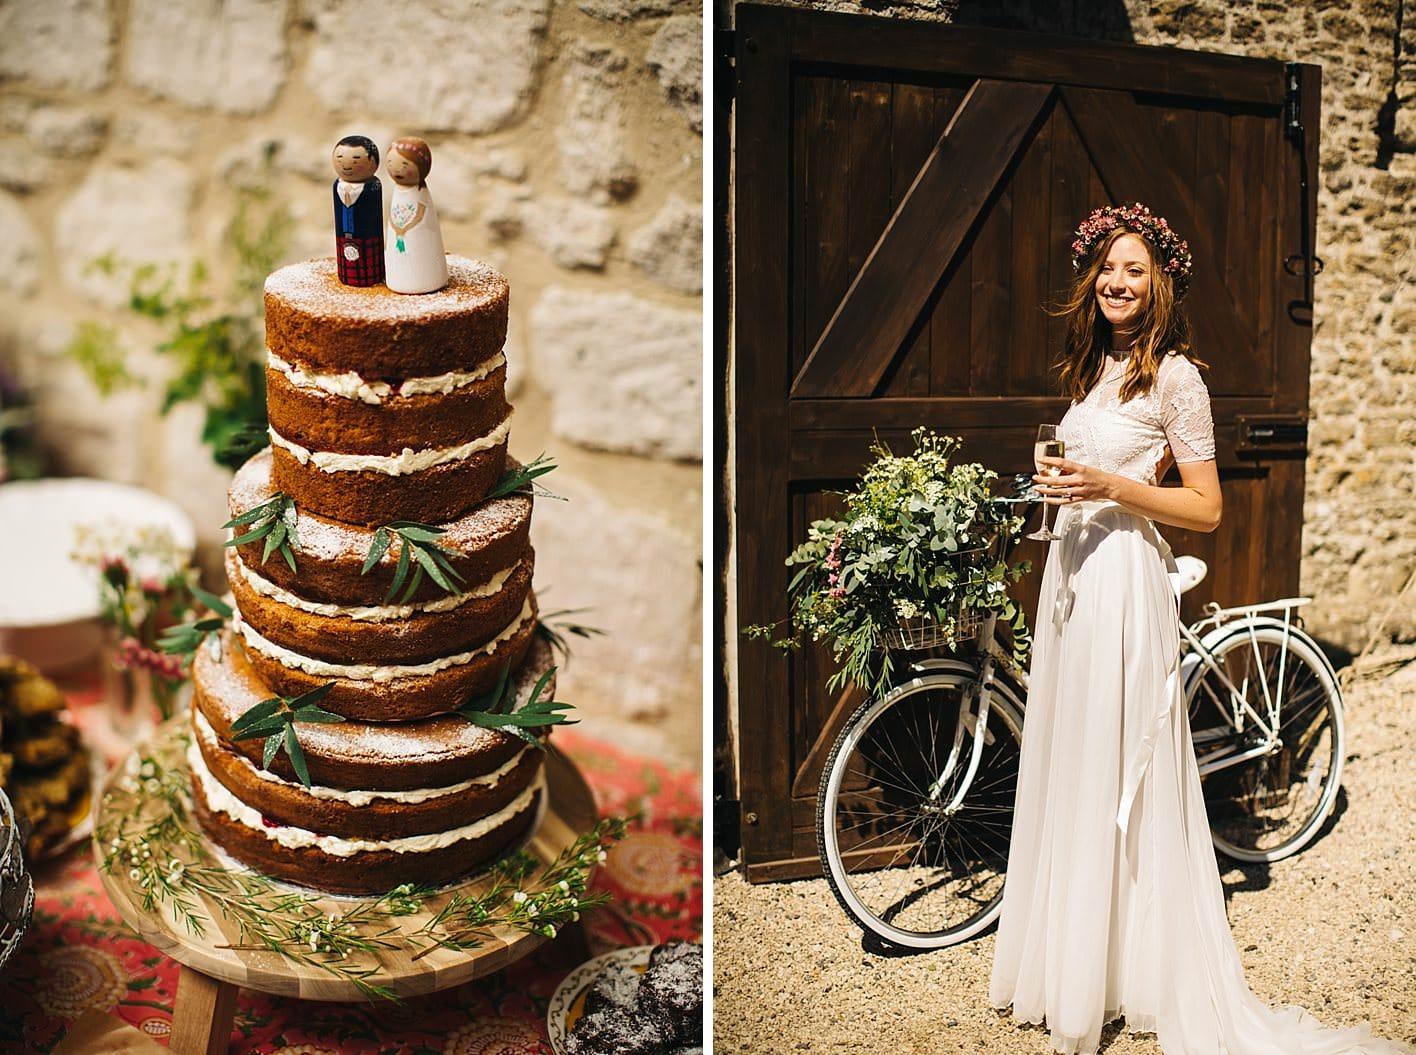 wedding cake by brides mum